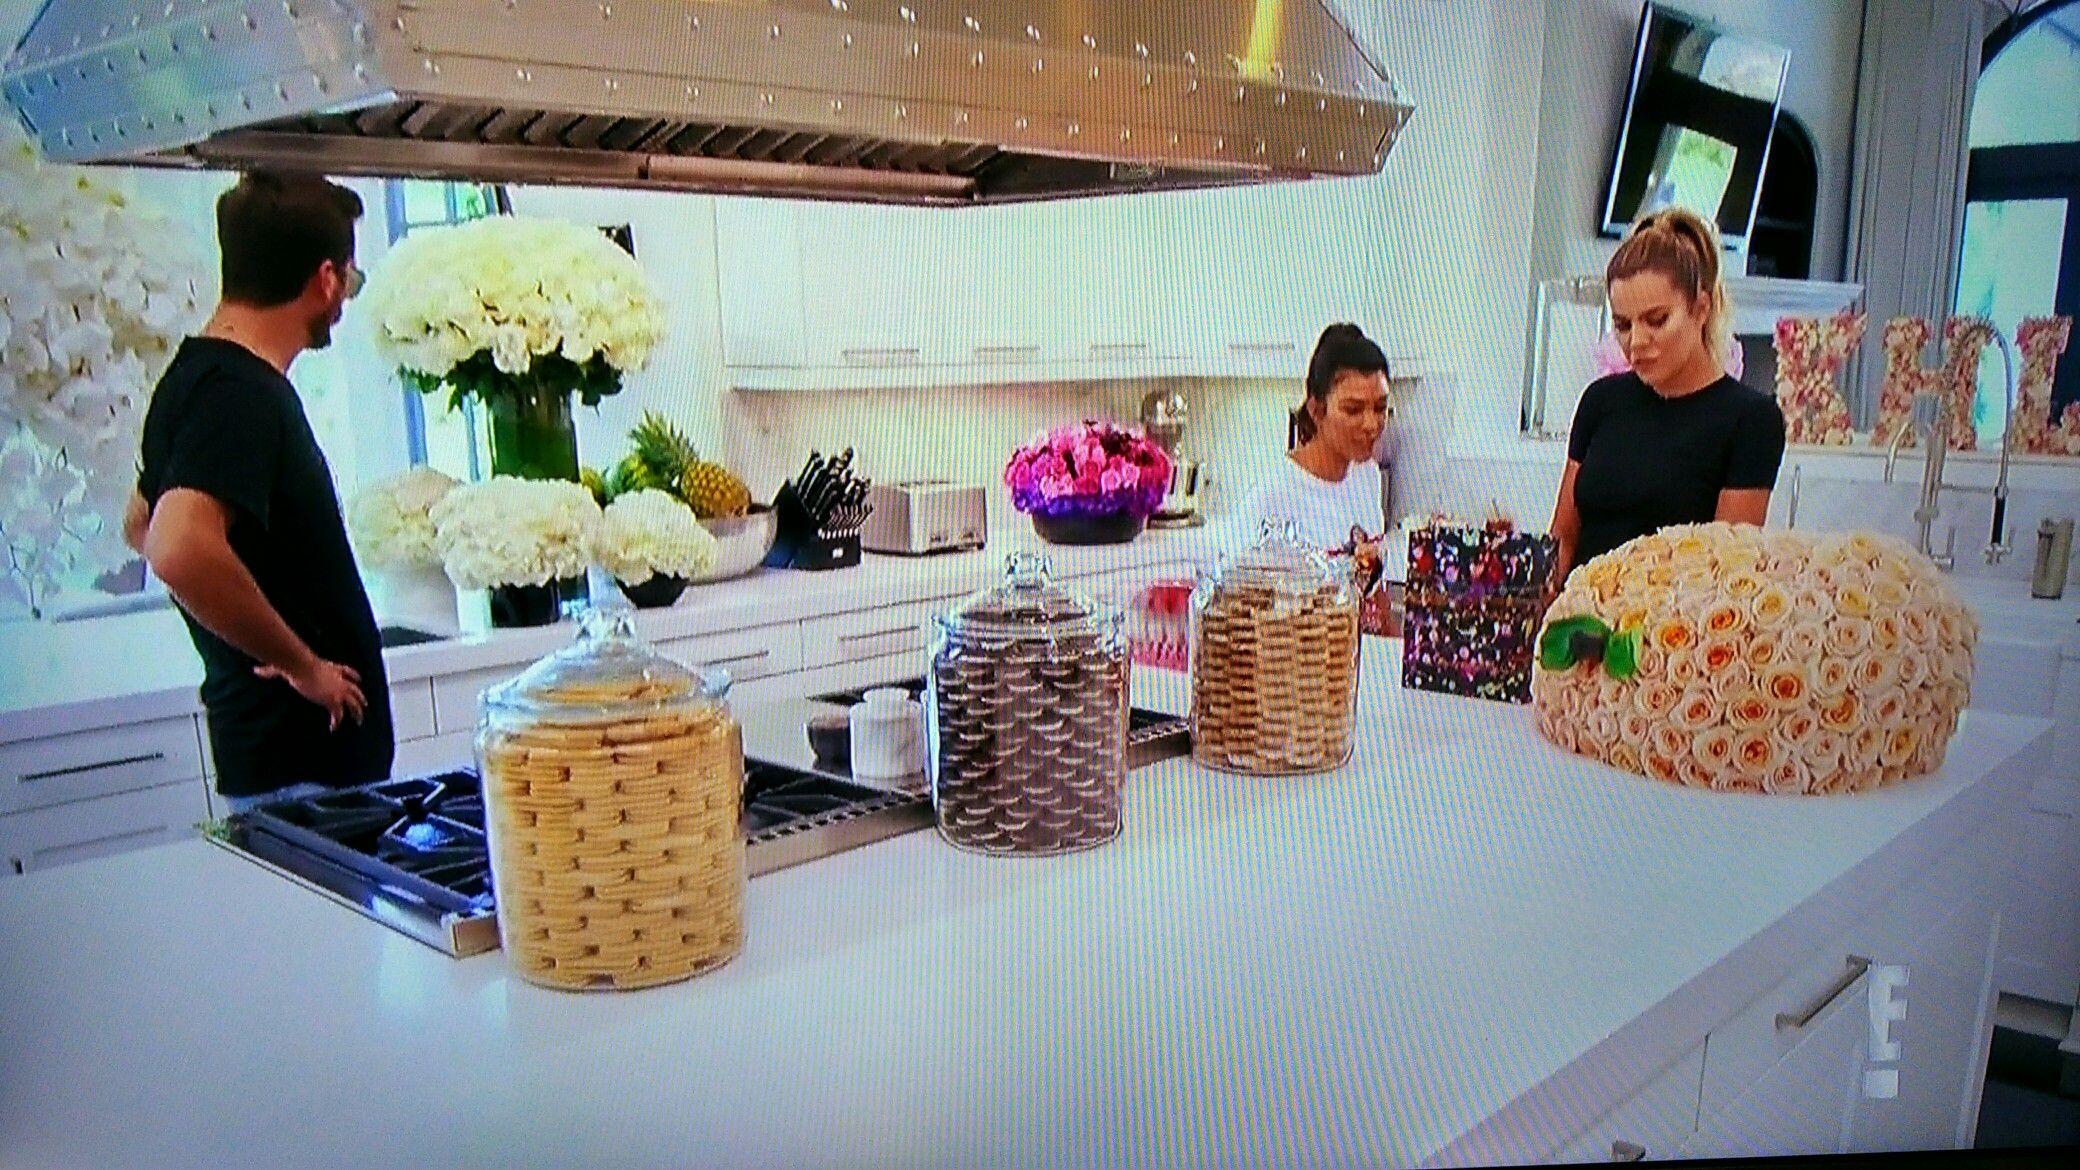 Khloe Kardashian Kitchen | kitchen | Pinterest | Khloe kardashian ...